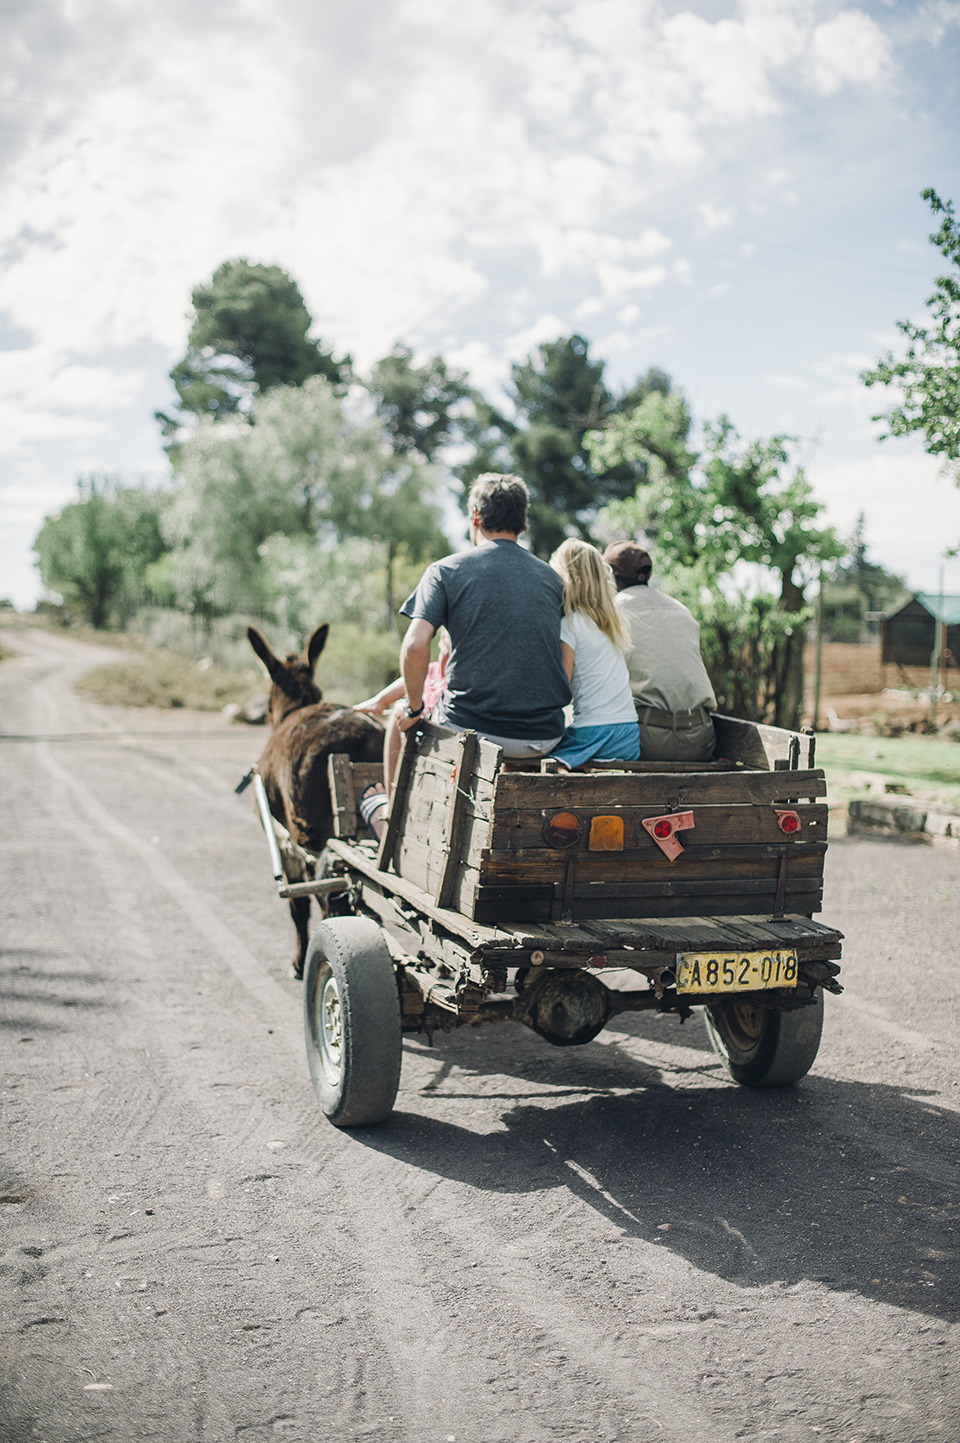 RyanParker_FineArtPhotographer_Travel_Karoo_Bloemhof_DSC_9159.jpg